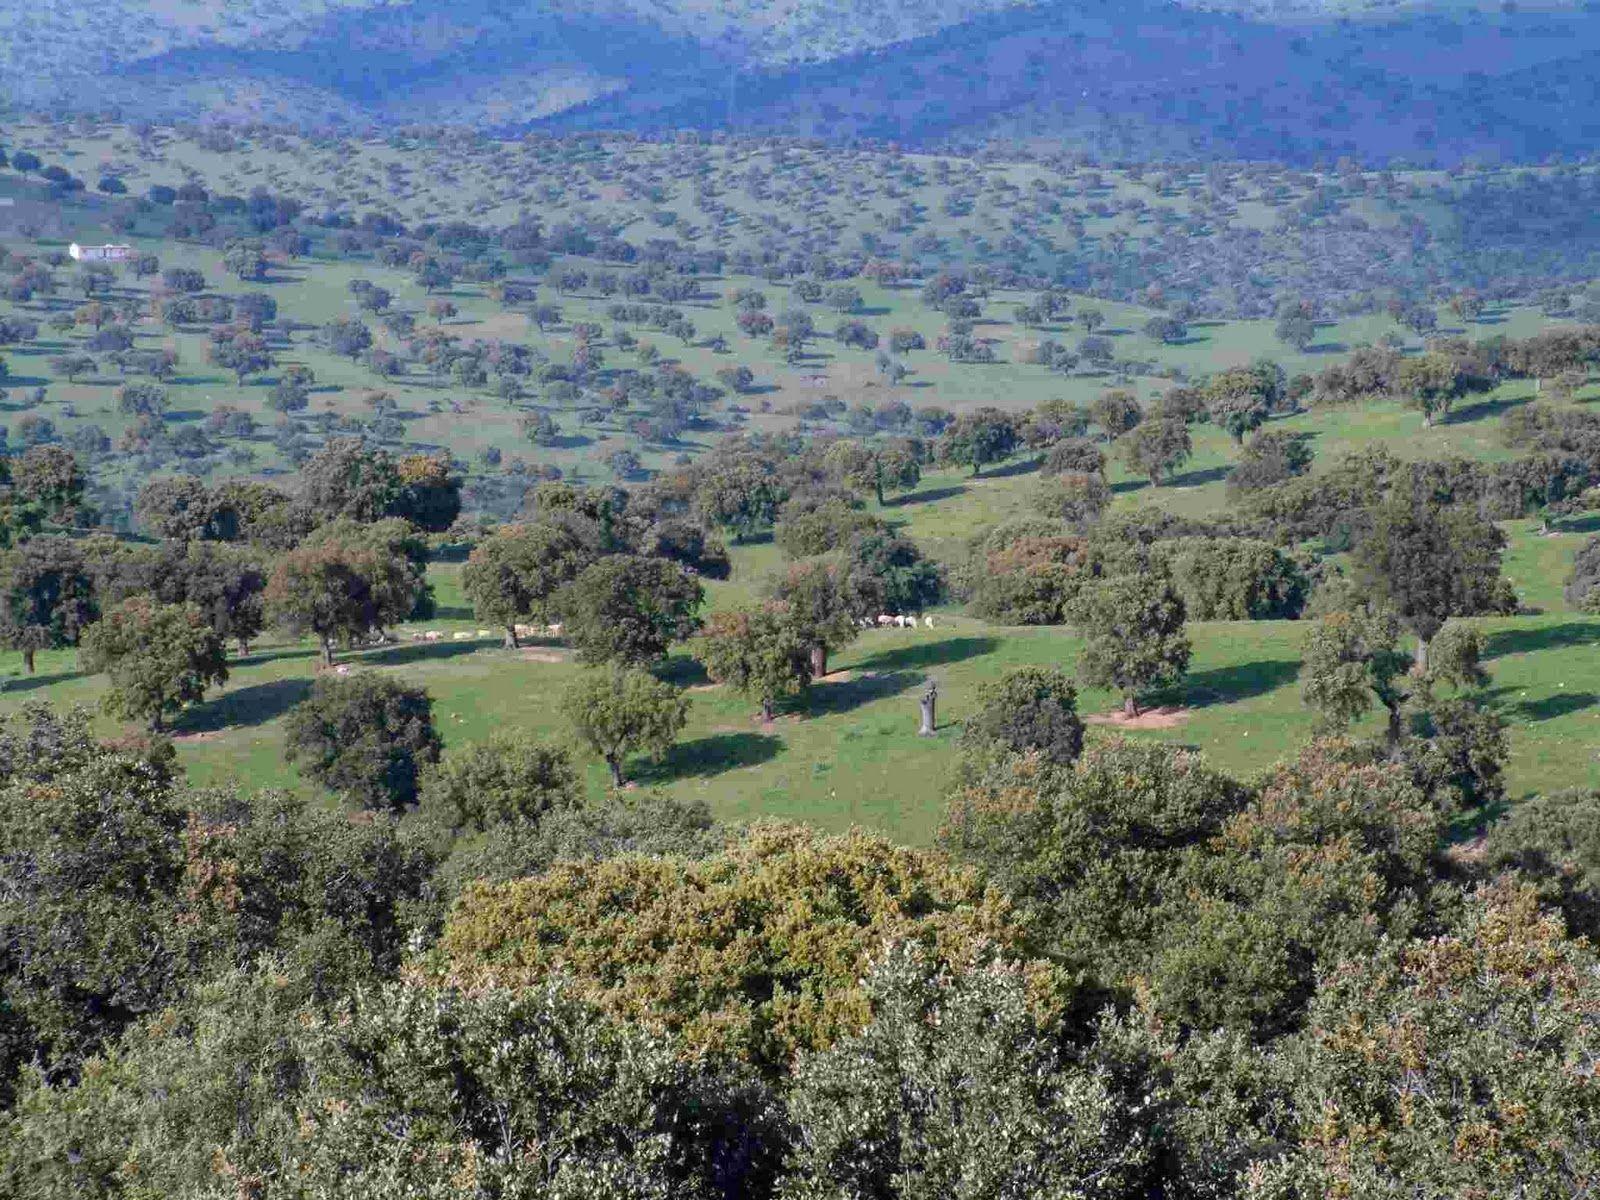 Regi n mediterr nea bosque perennifolio diversidad biogeogr fica espa ola - La mediterranea ...